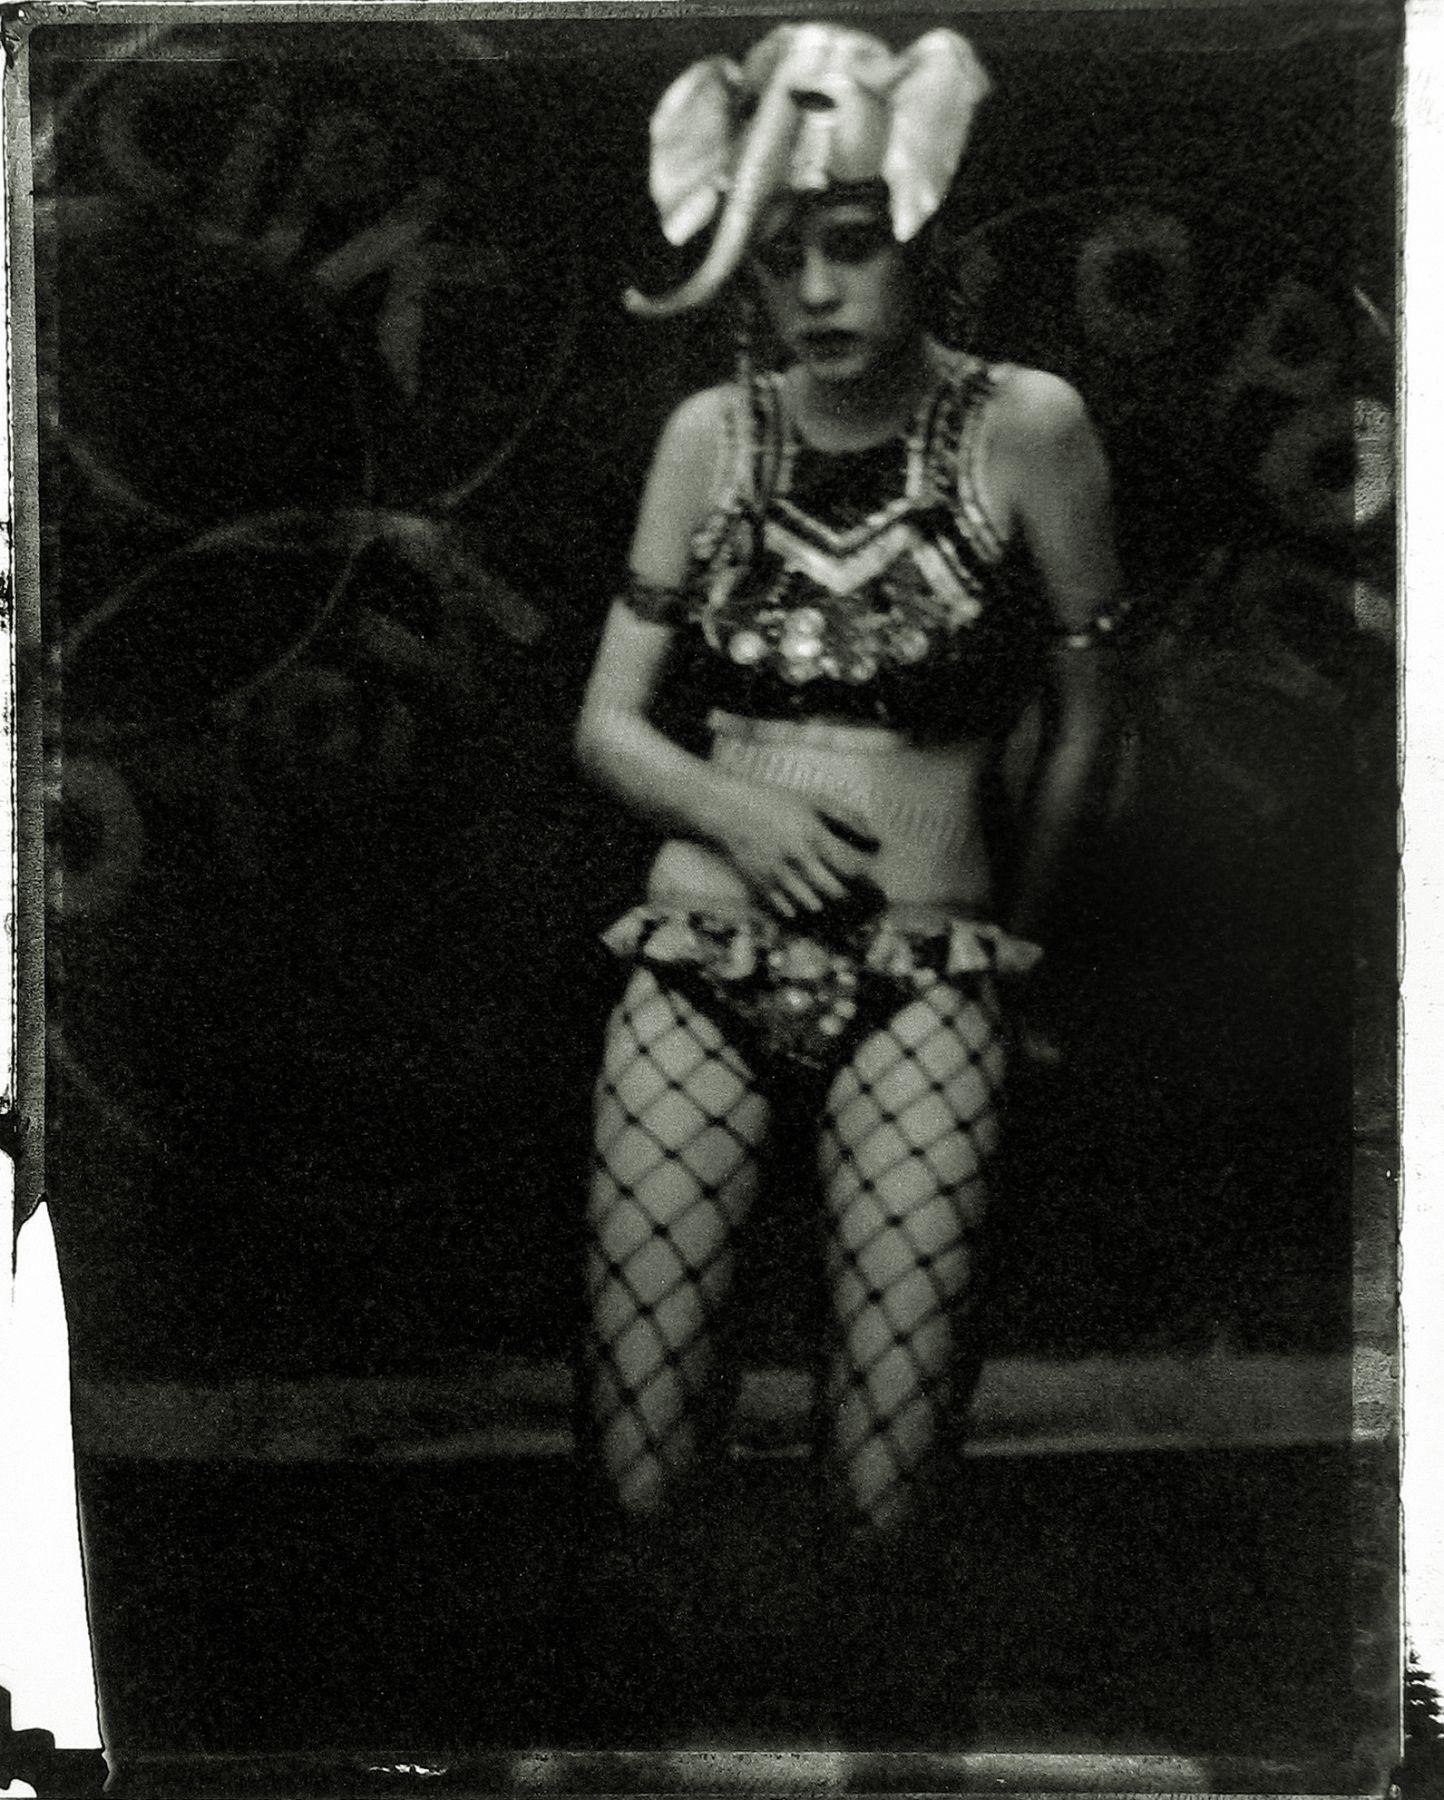 Sarah Moon: Circus 2004 2005 howard greenberg gallery